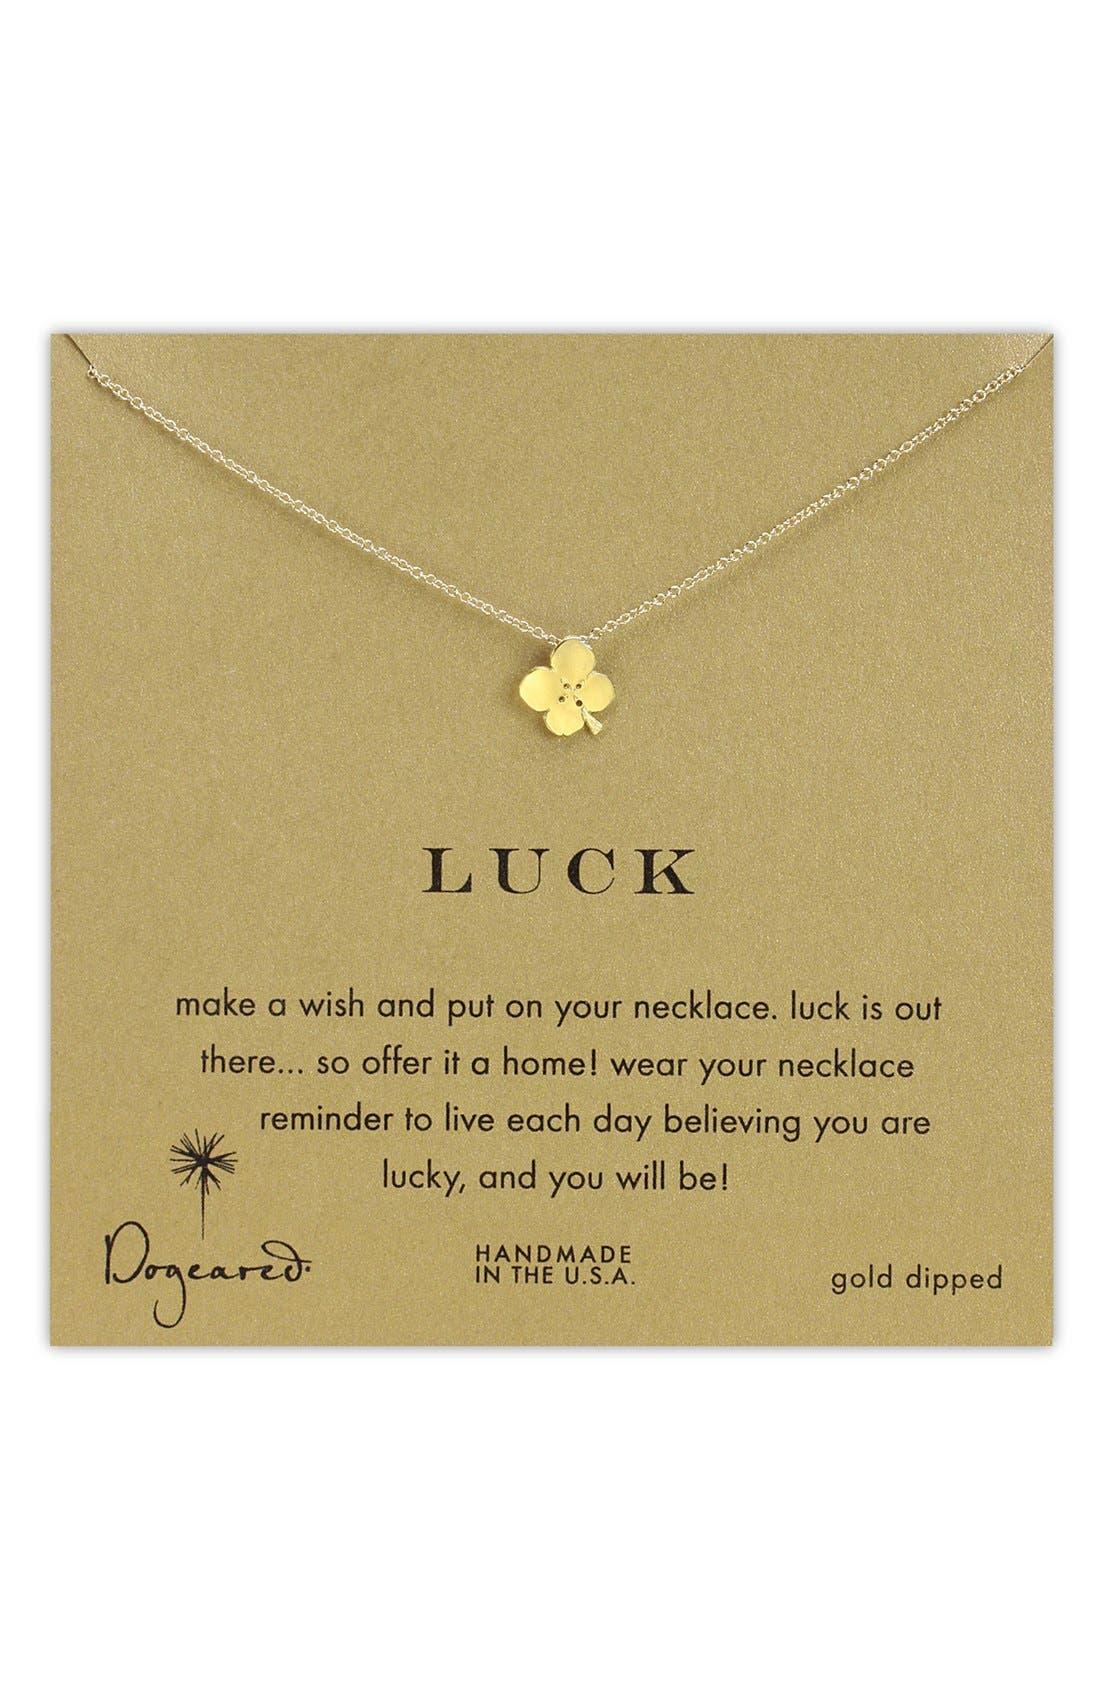 Alternate Image 1 Selected - Dogeared 'Luck' Clover Pendant Necklace